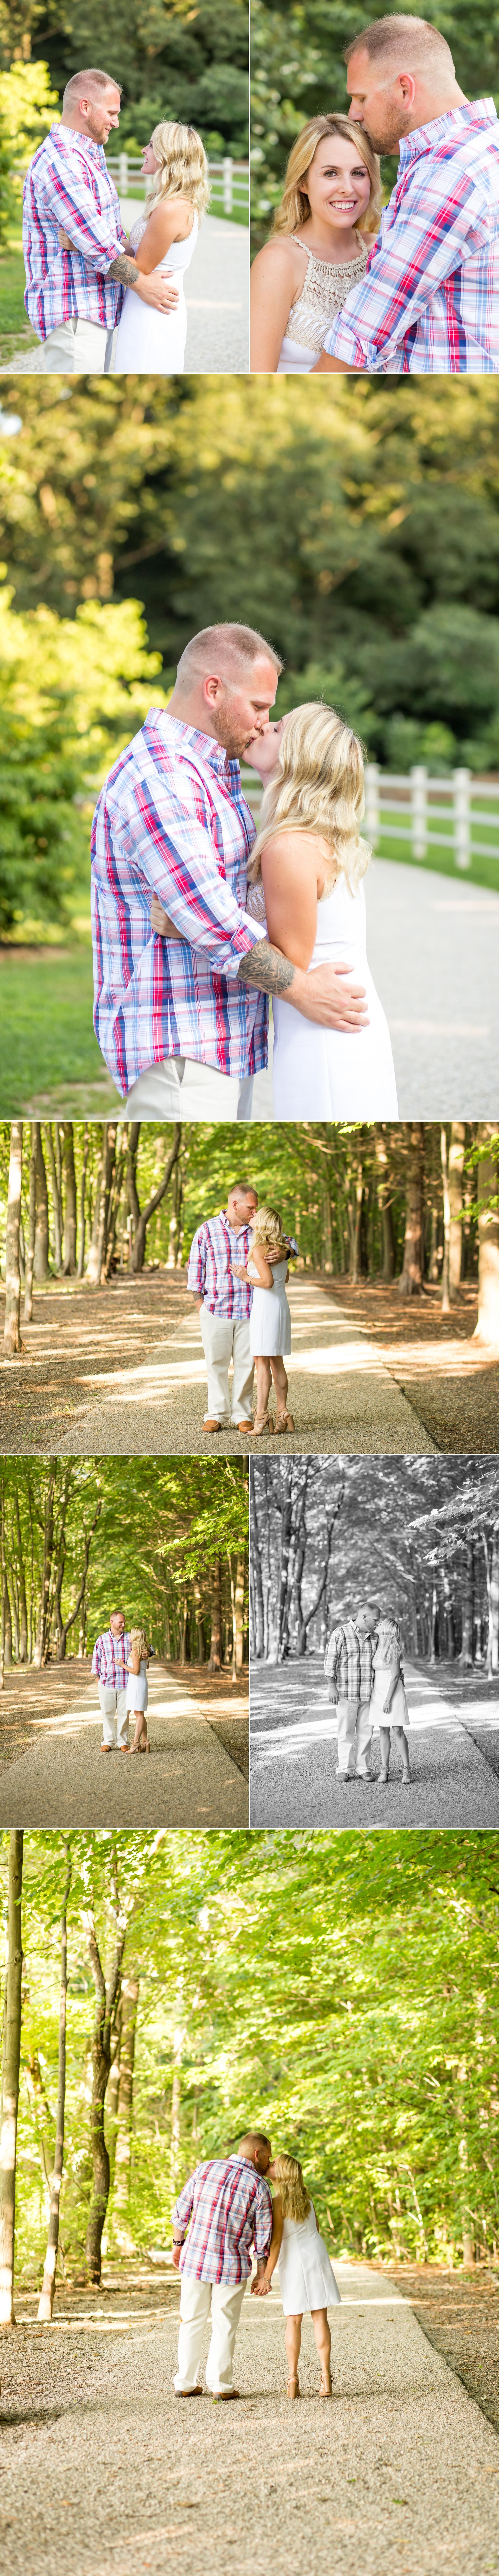 Melissa + Andy   Wedding Proposal   Shaina Lee Photography   CT, NYC + Destination Wedding + Engagement Photographer   Cranbury Park Gallaher Mansion Wedding Proposal   Connecticut Engagement